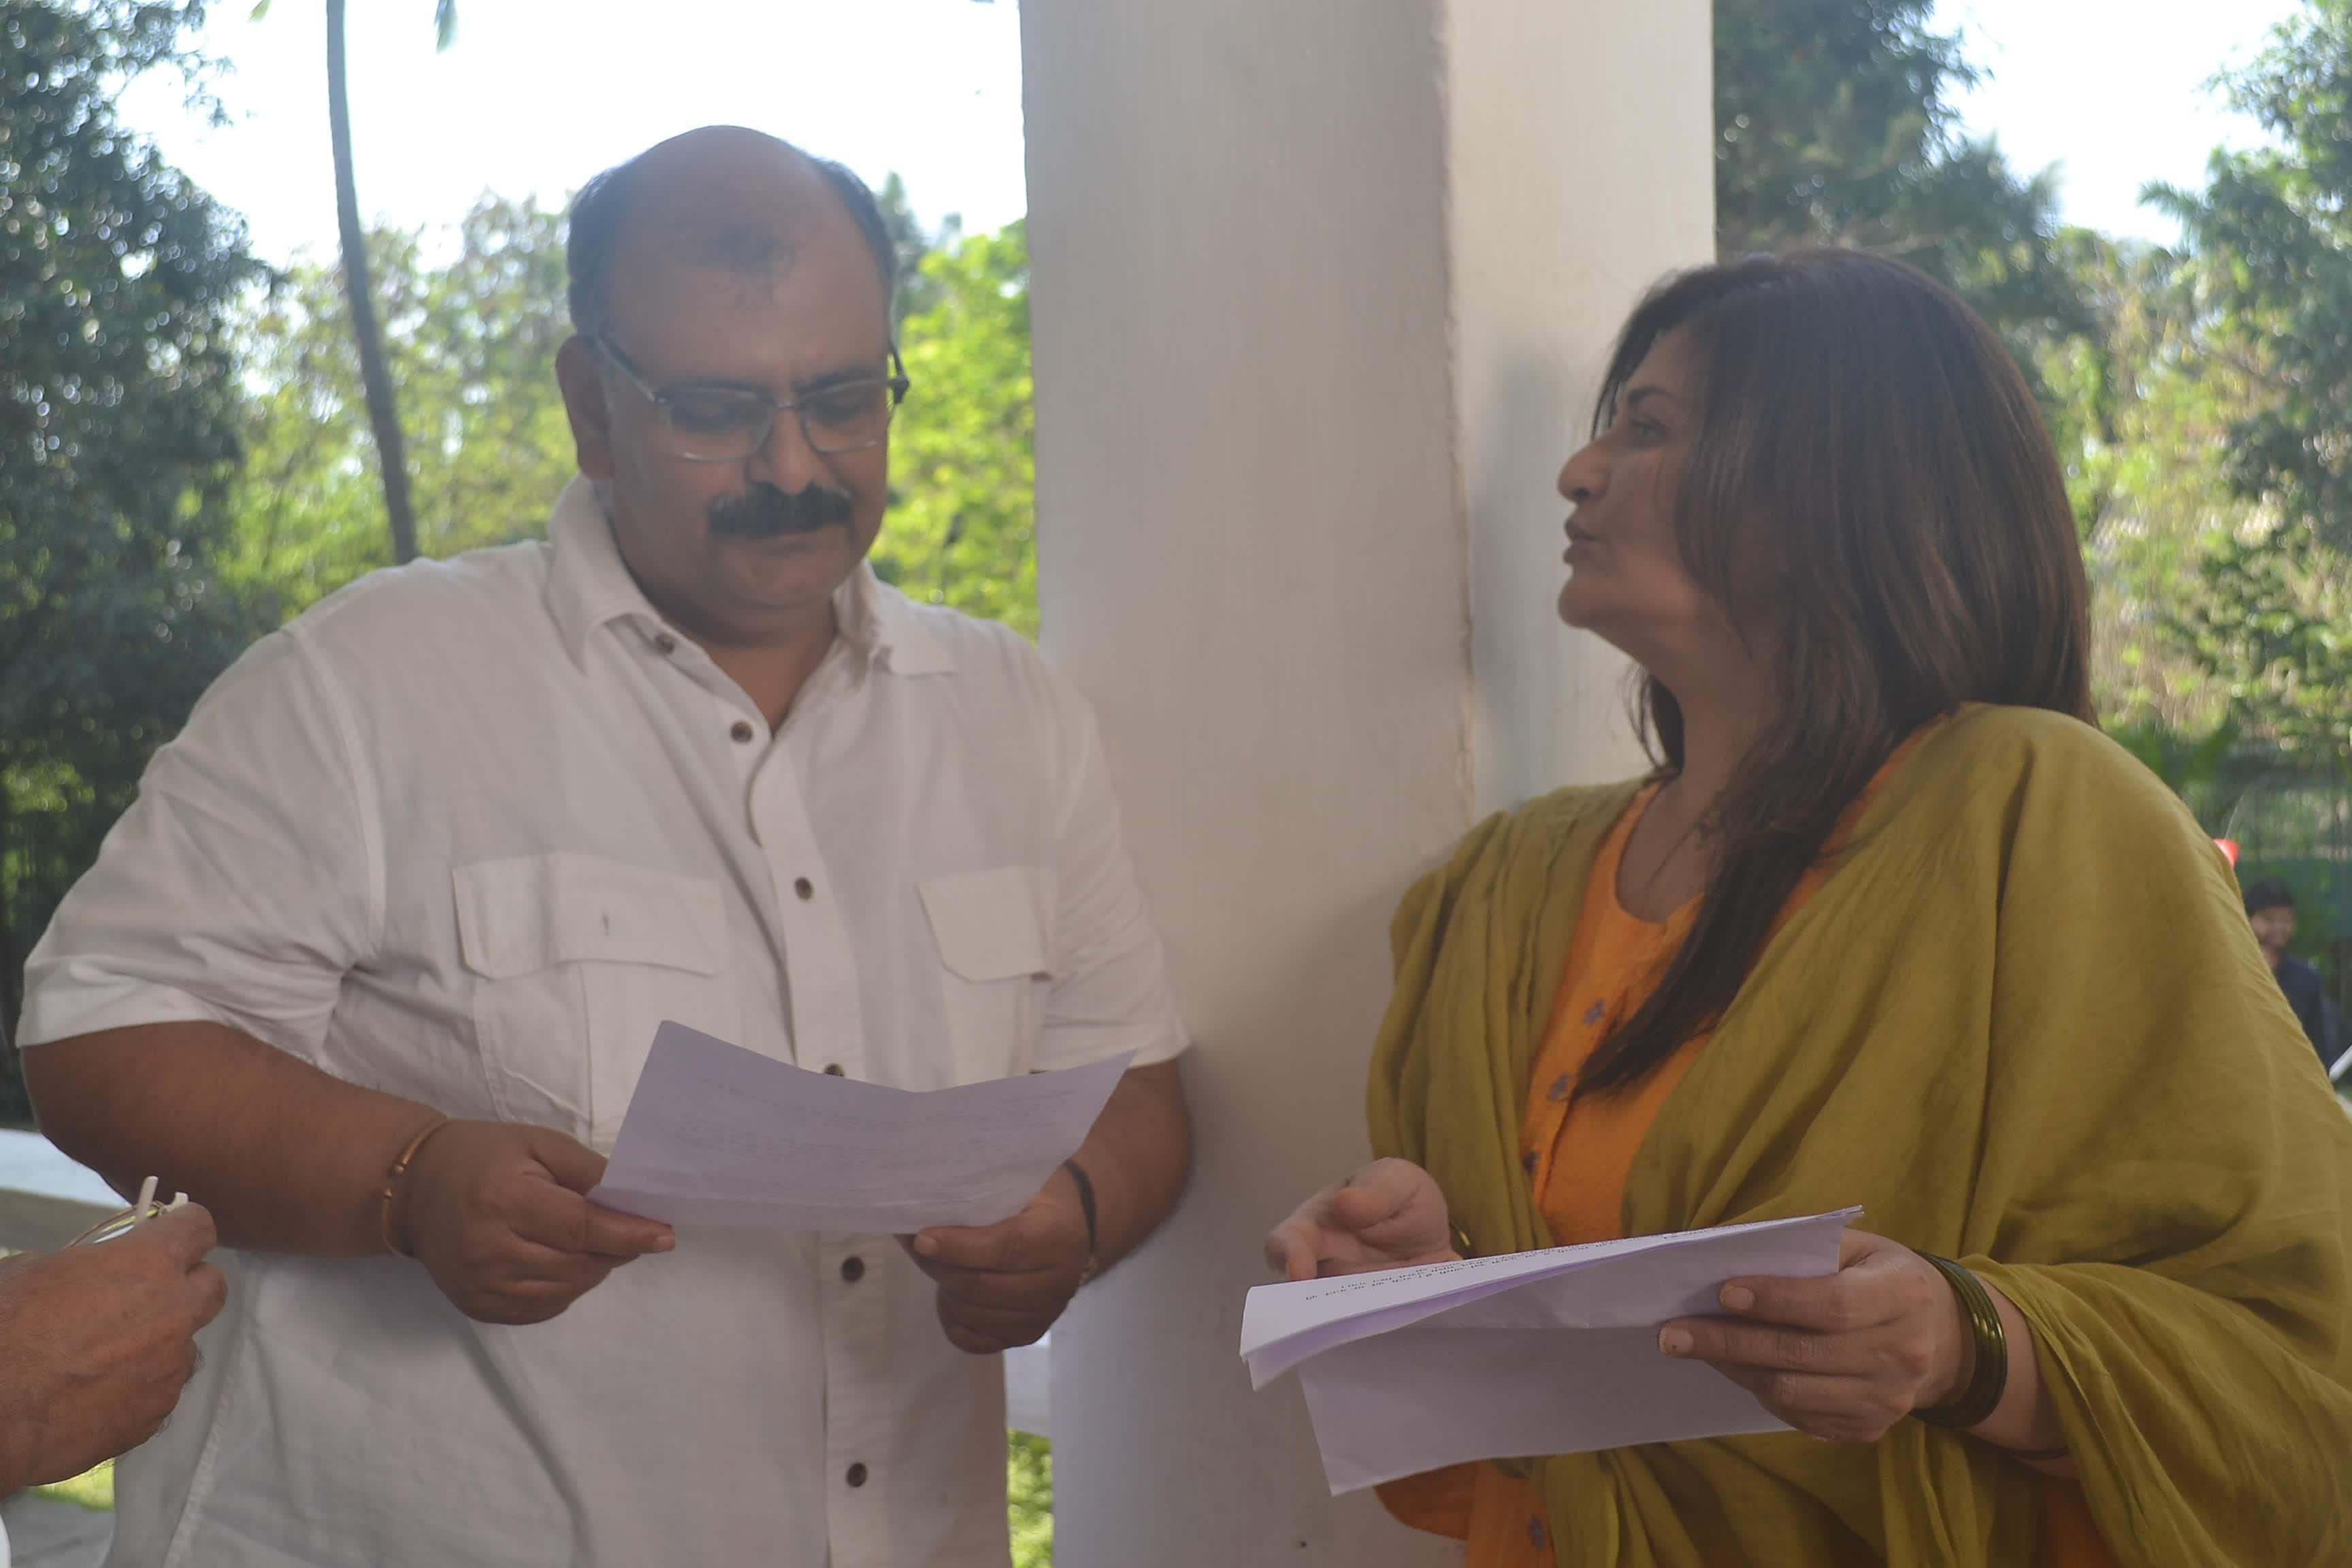 Sarika,Sarika web series,Vinay Pathak, Vinay Pathak sarika, SarikaAb Ki Baari Vipin Bihari,Ab Ki Baari Vipin Bihari